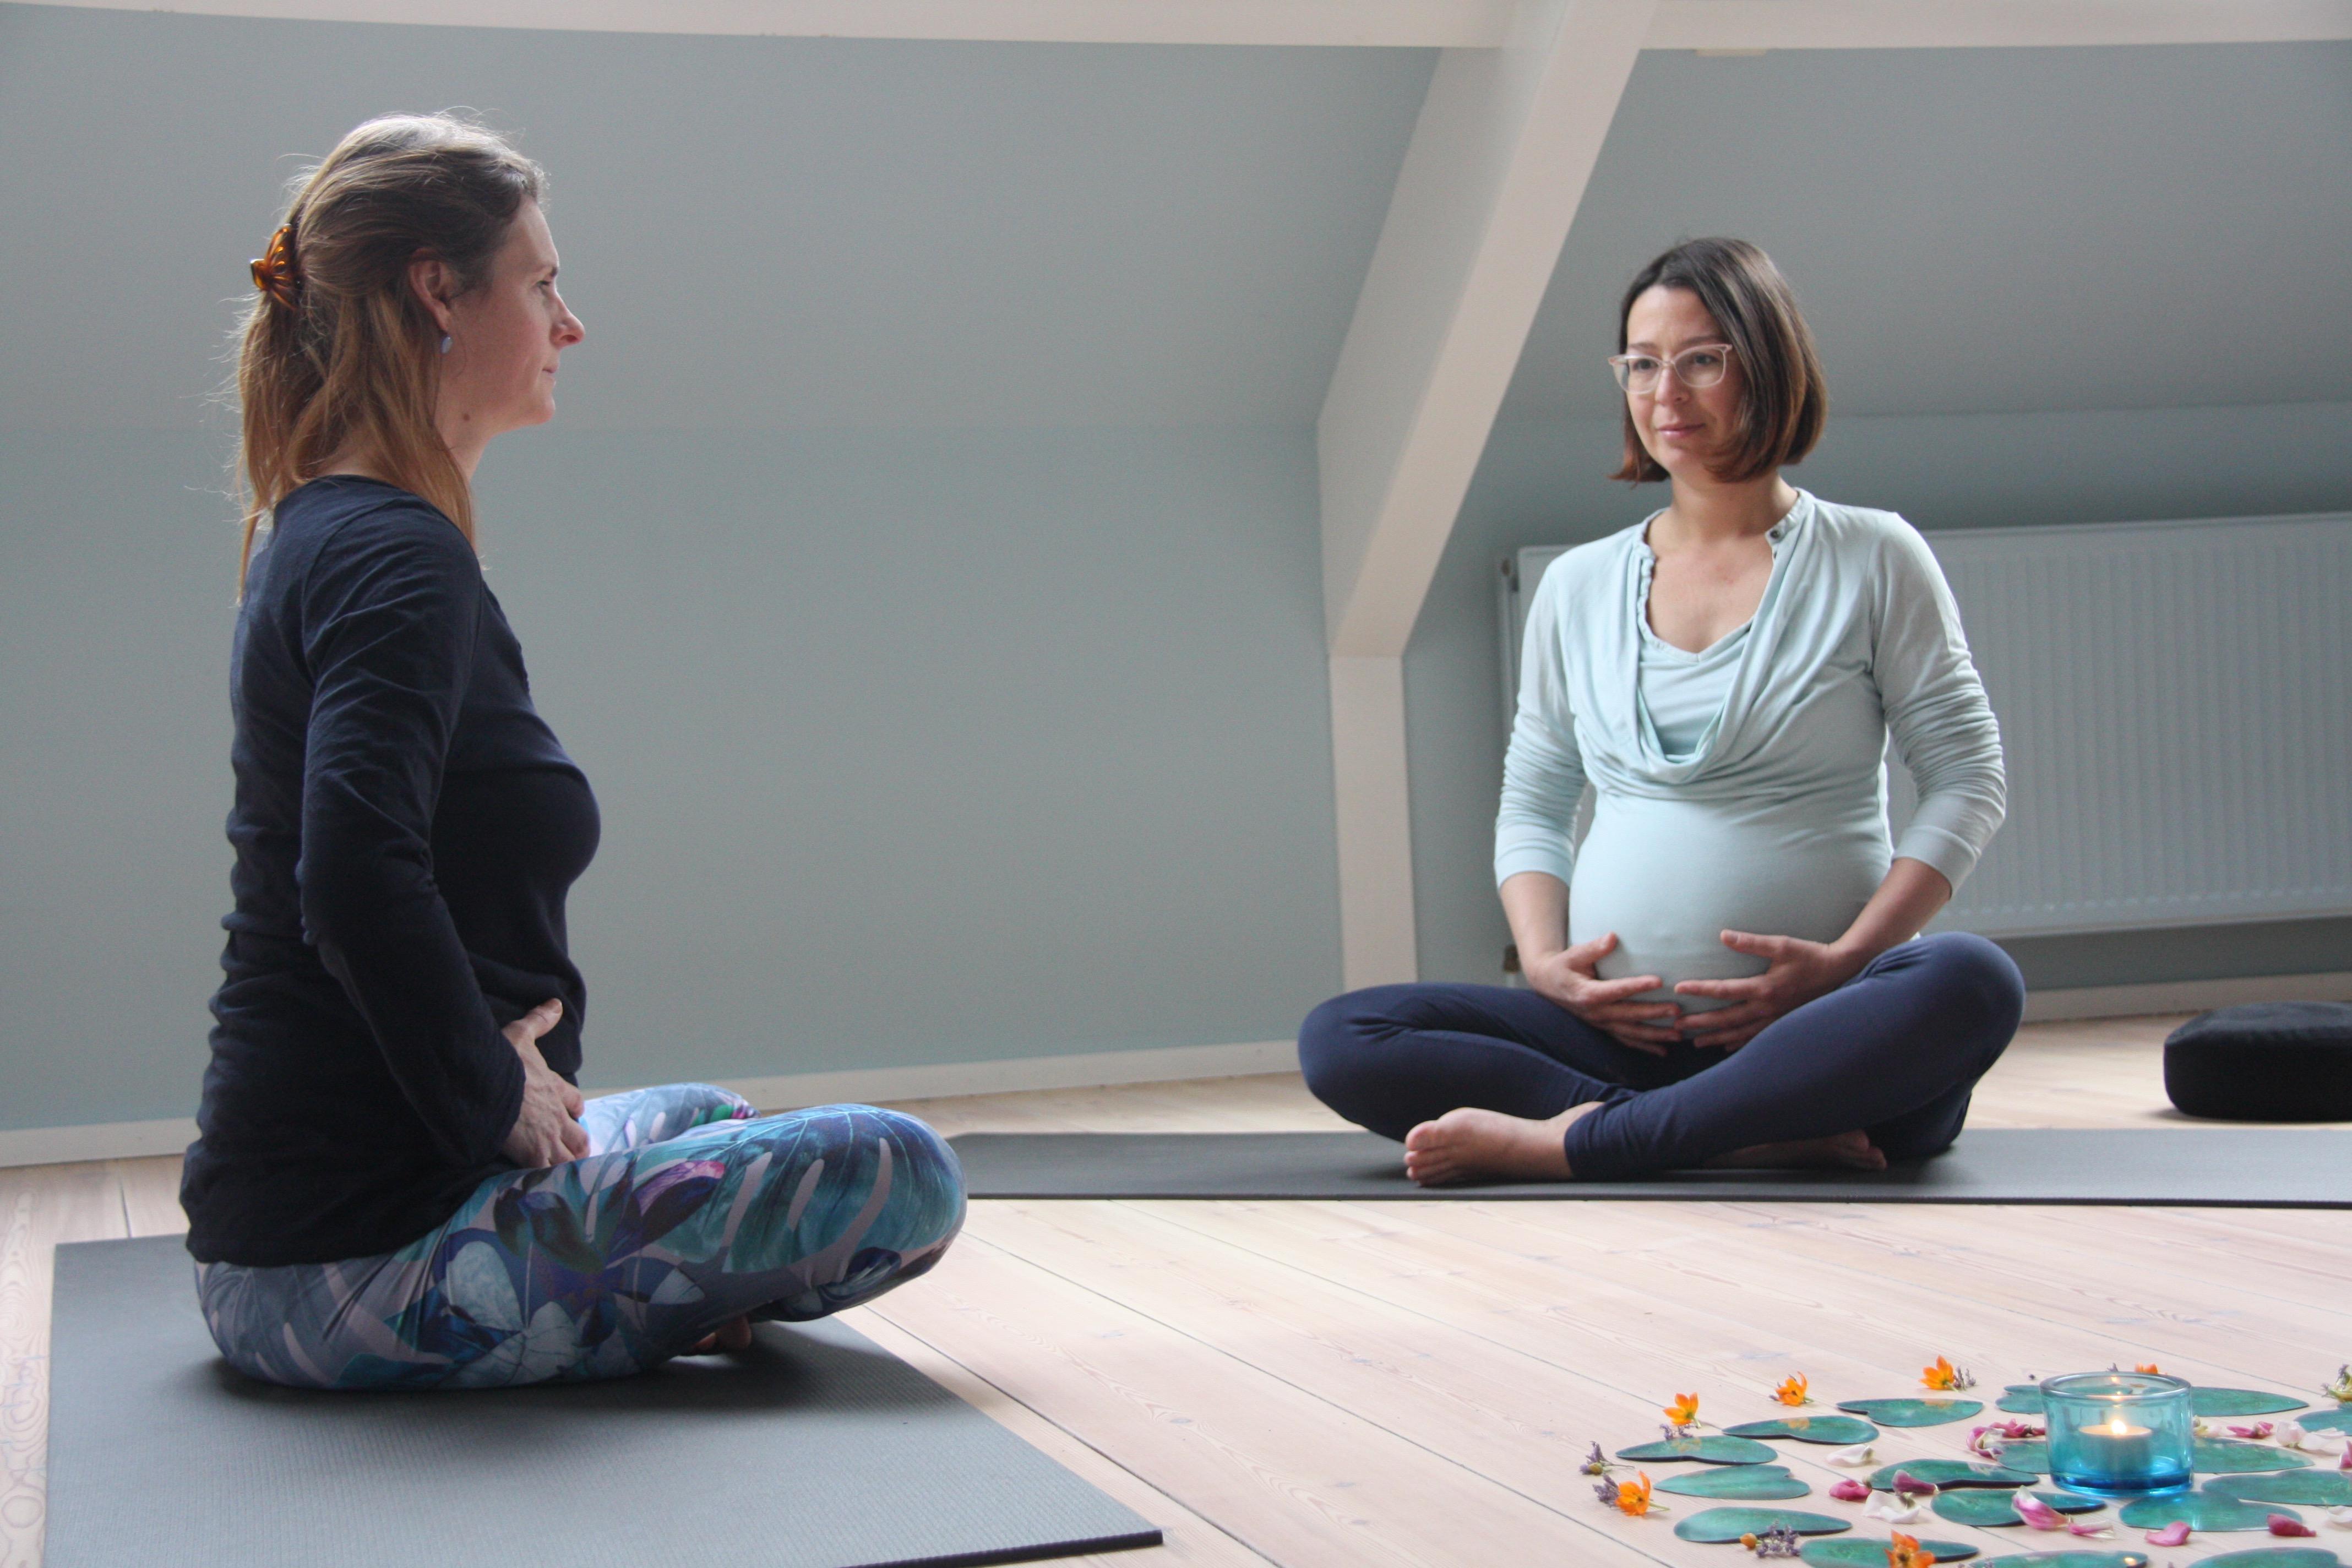 Zwangerschapsyoga door Guusje Chabot bij Yogacentrum Eemland